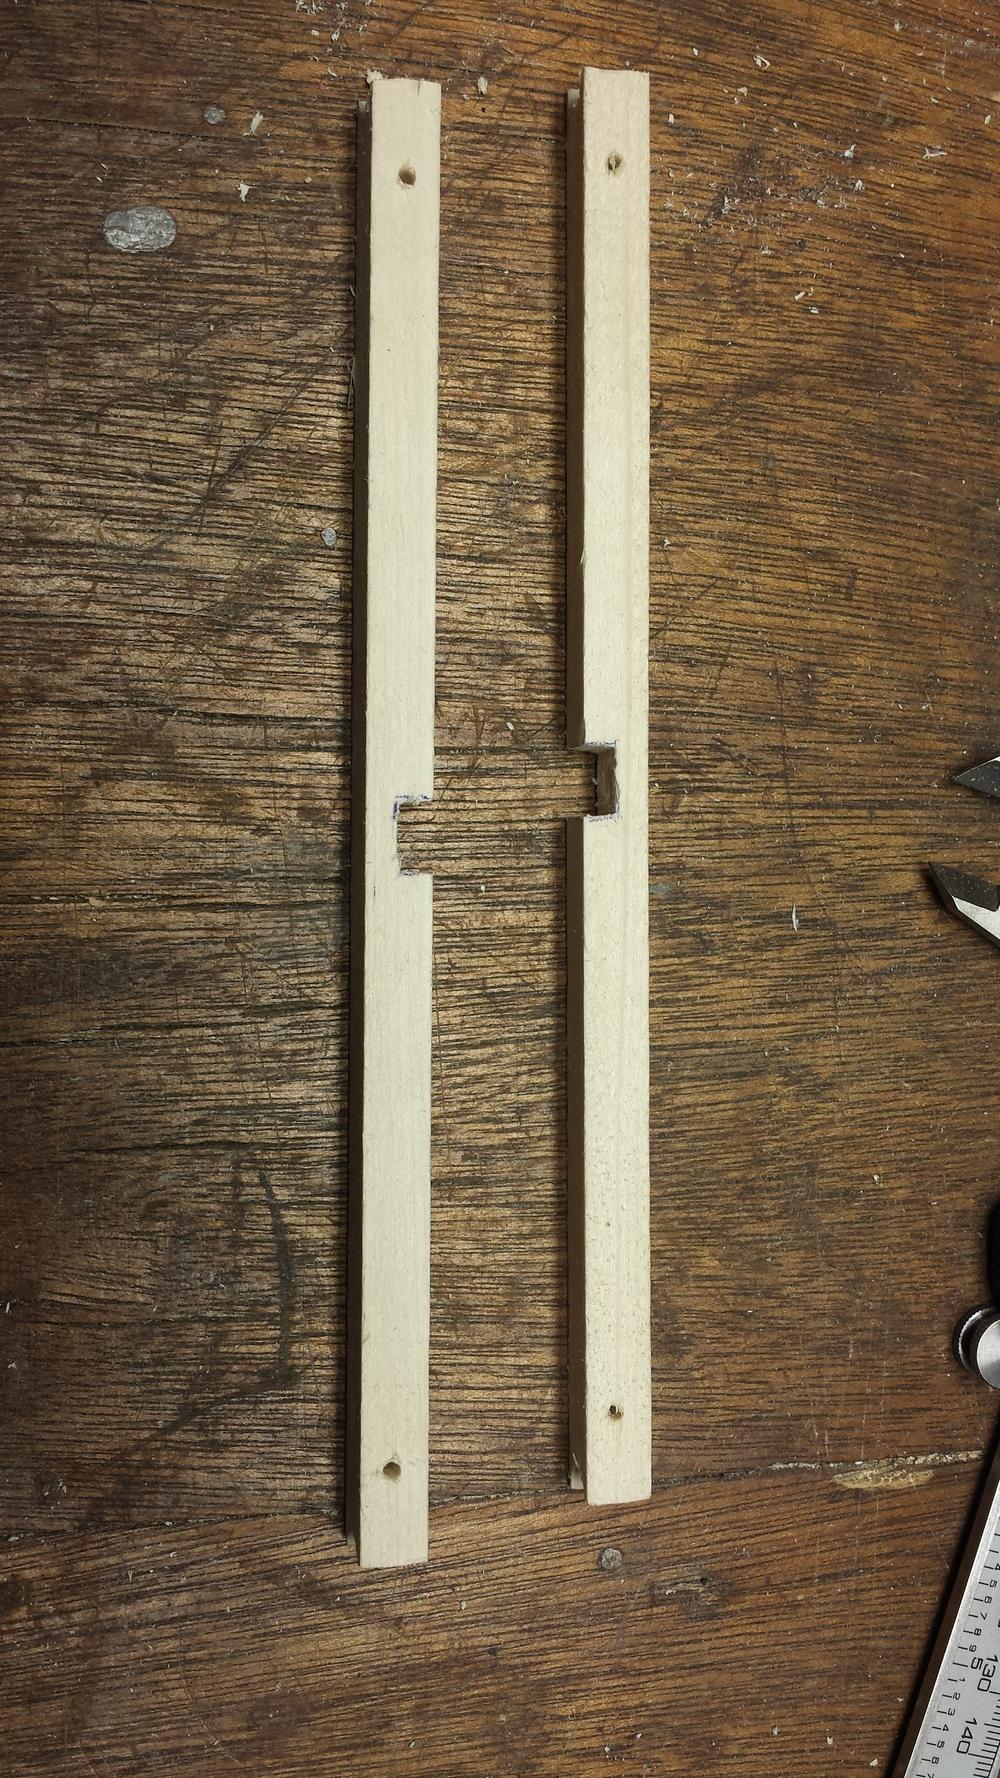 Zip Tie Mounting Holes